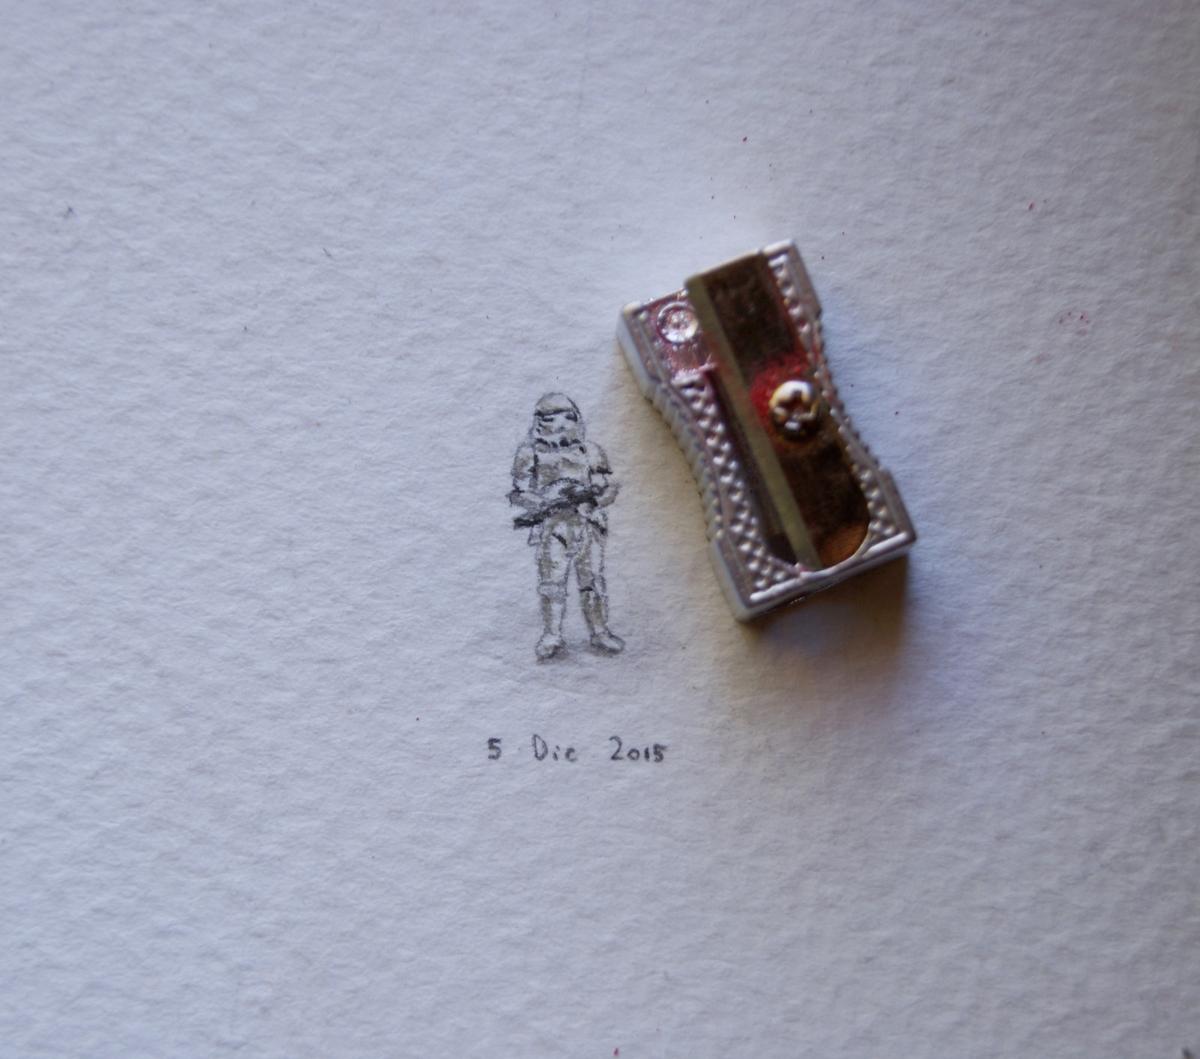 12-Star-Wars-Stormtrooper-Guillermo-Méndez-Mr-Luigi-Miniature-Drawings-and-Watercolor-Paintings-www-designstack-co